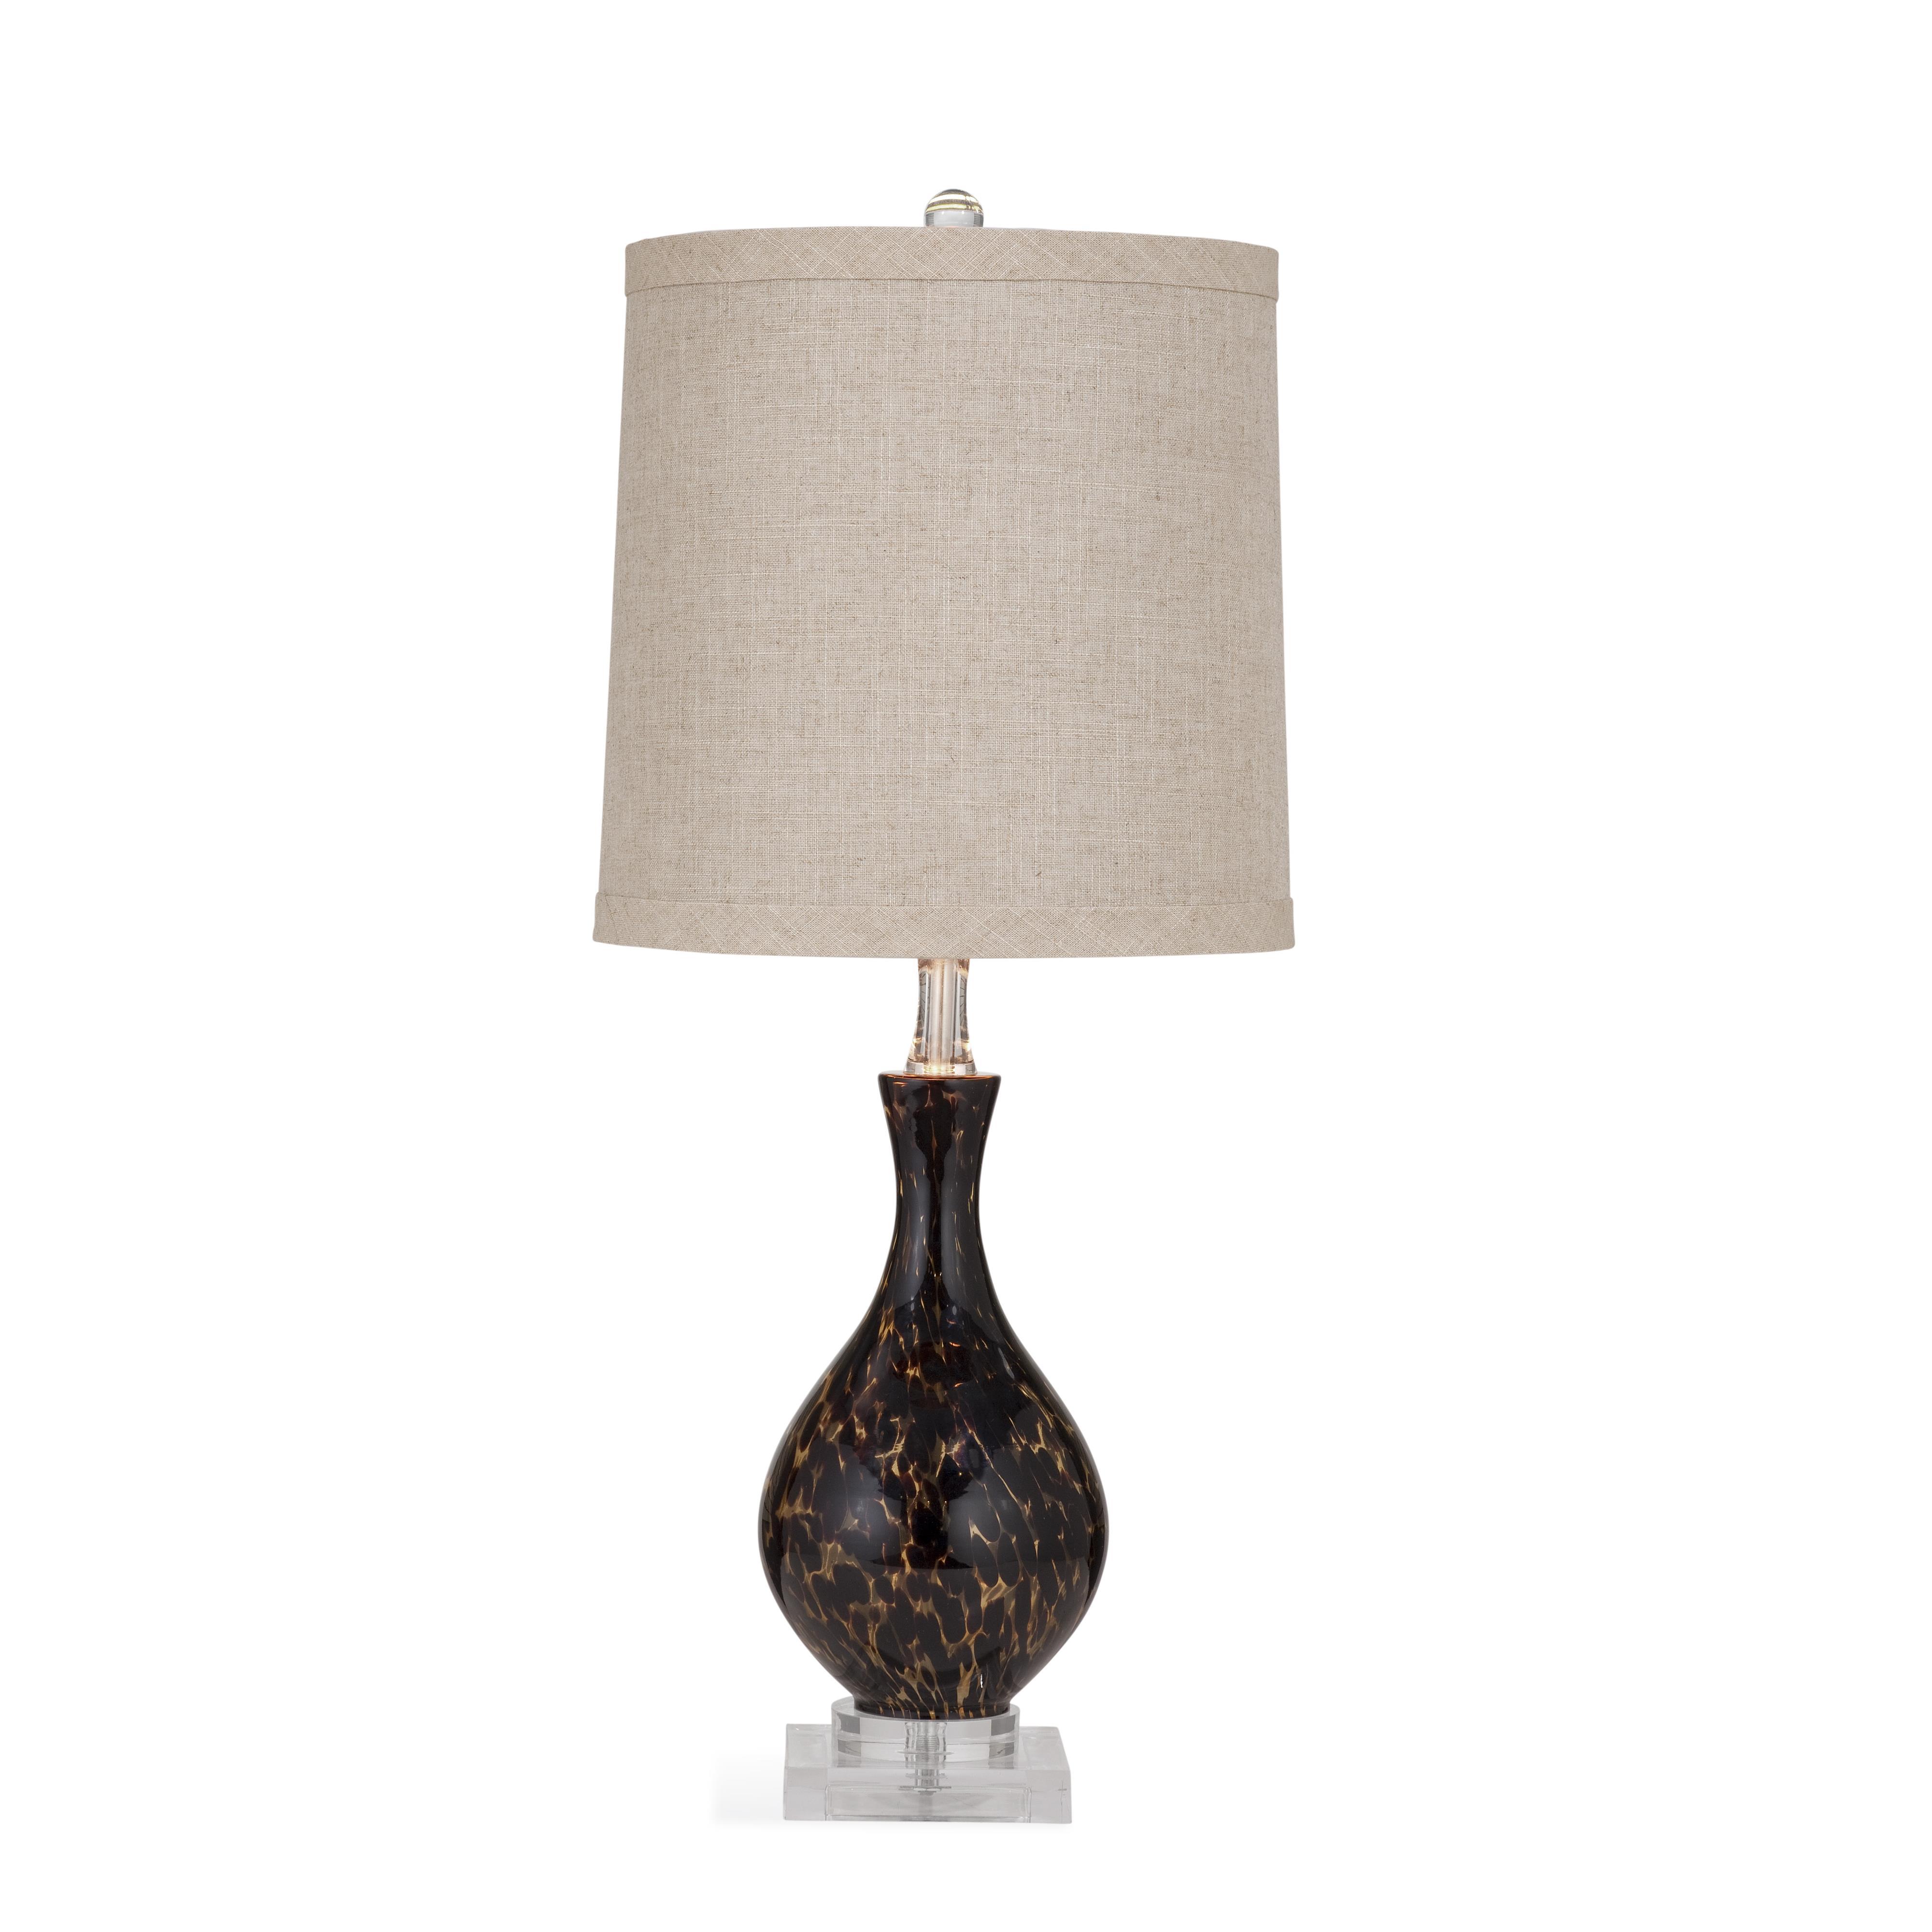 Pembroke Table Lamp